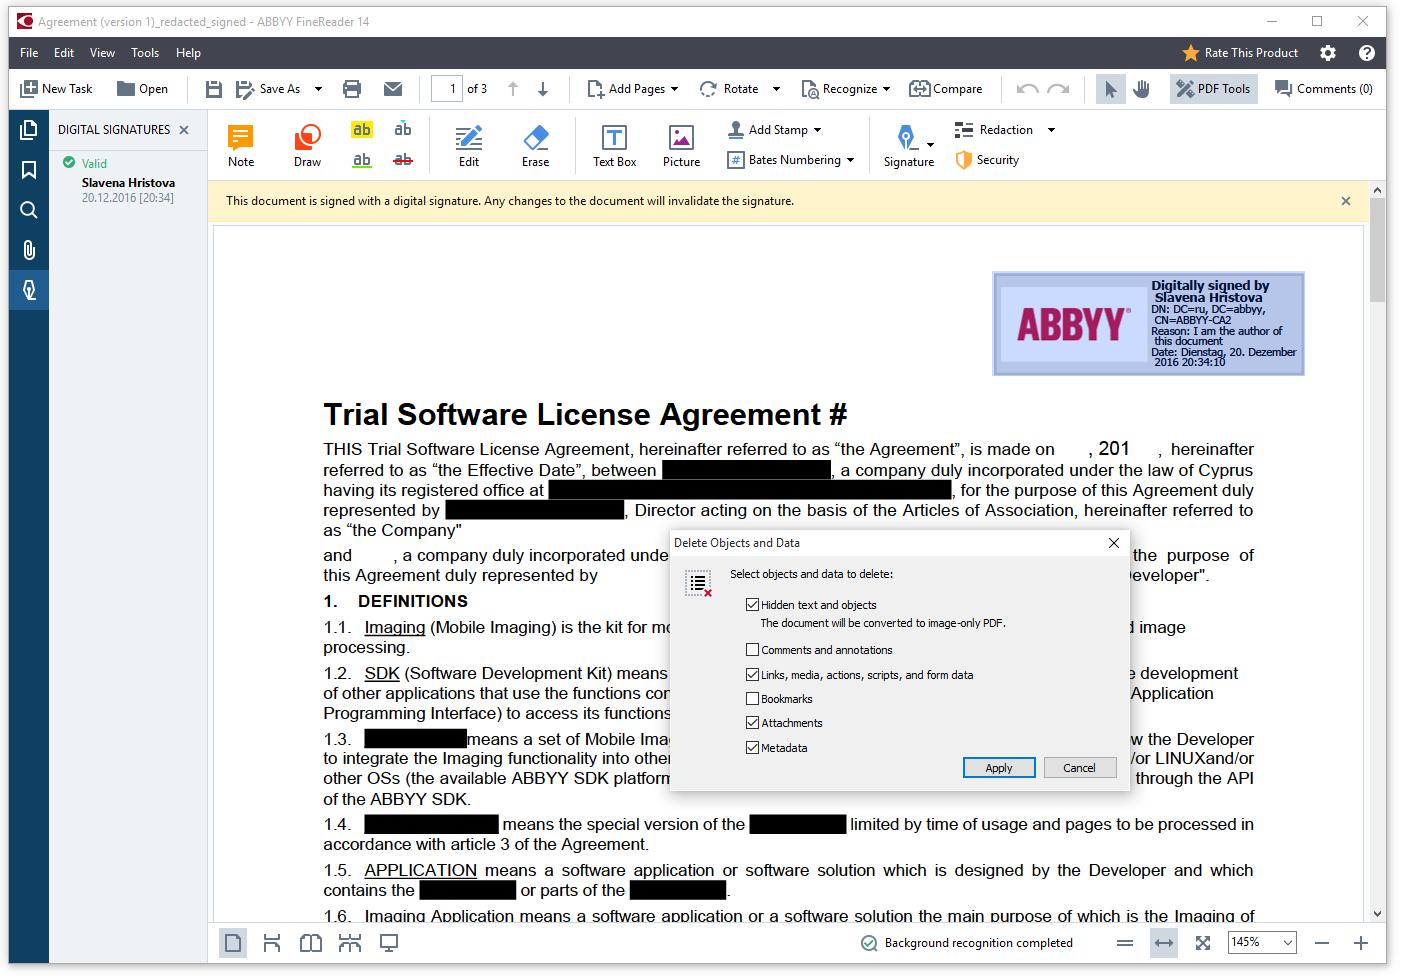 abbyy finereader 12 license file download